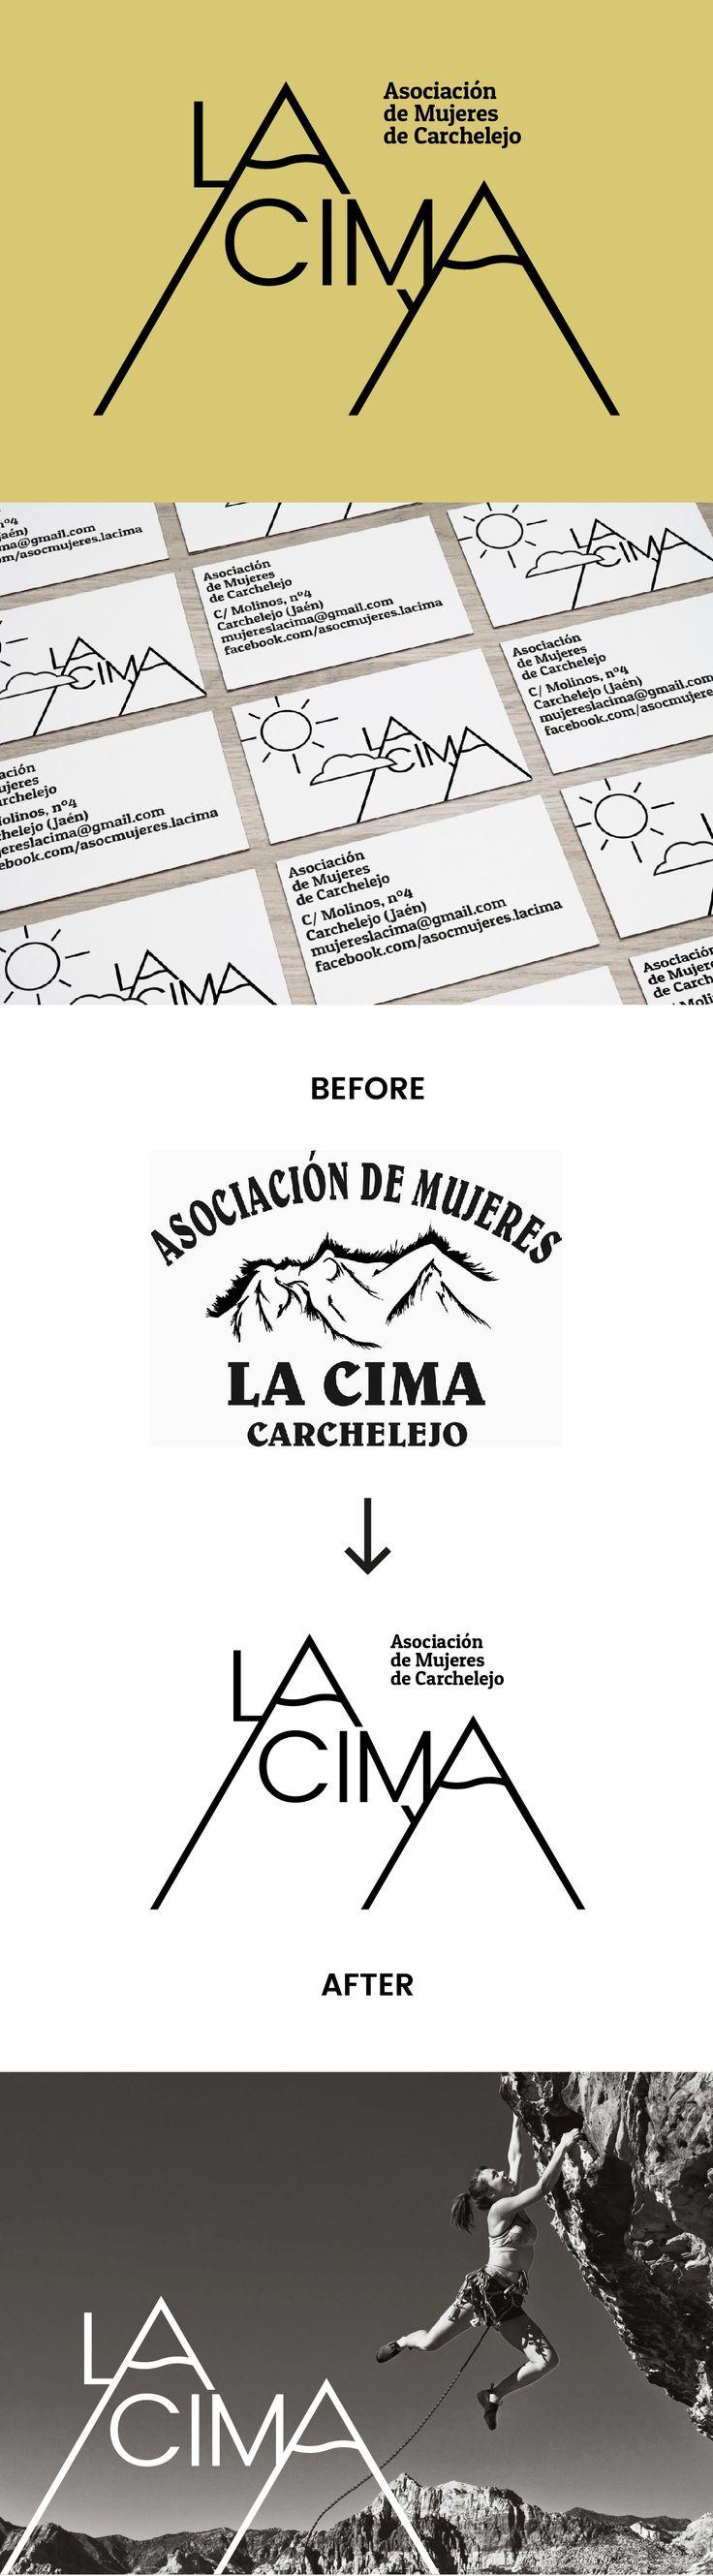 Visual identity redesign project for Women's Association LA CIMA (Carchelejo) | September 2016 | Roberto García